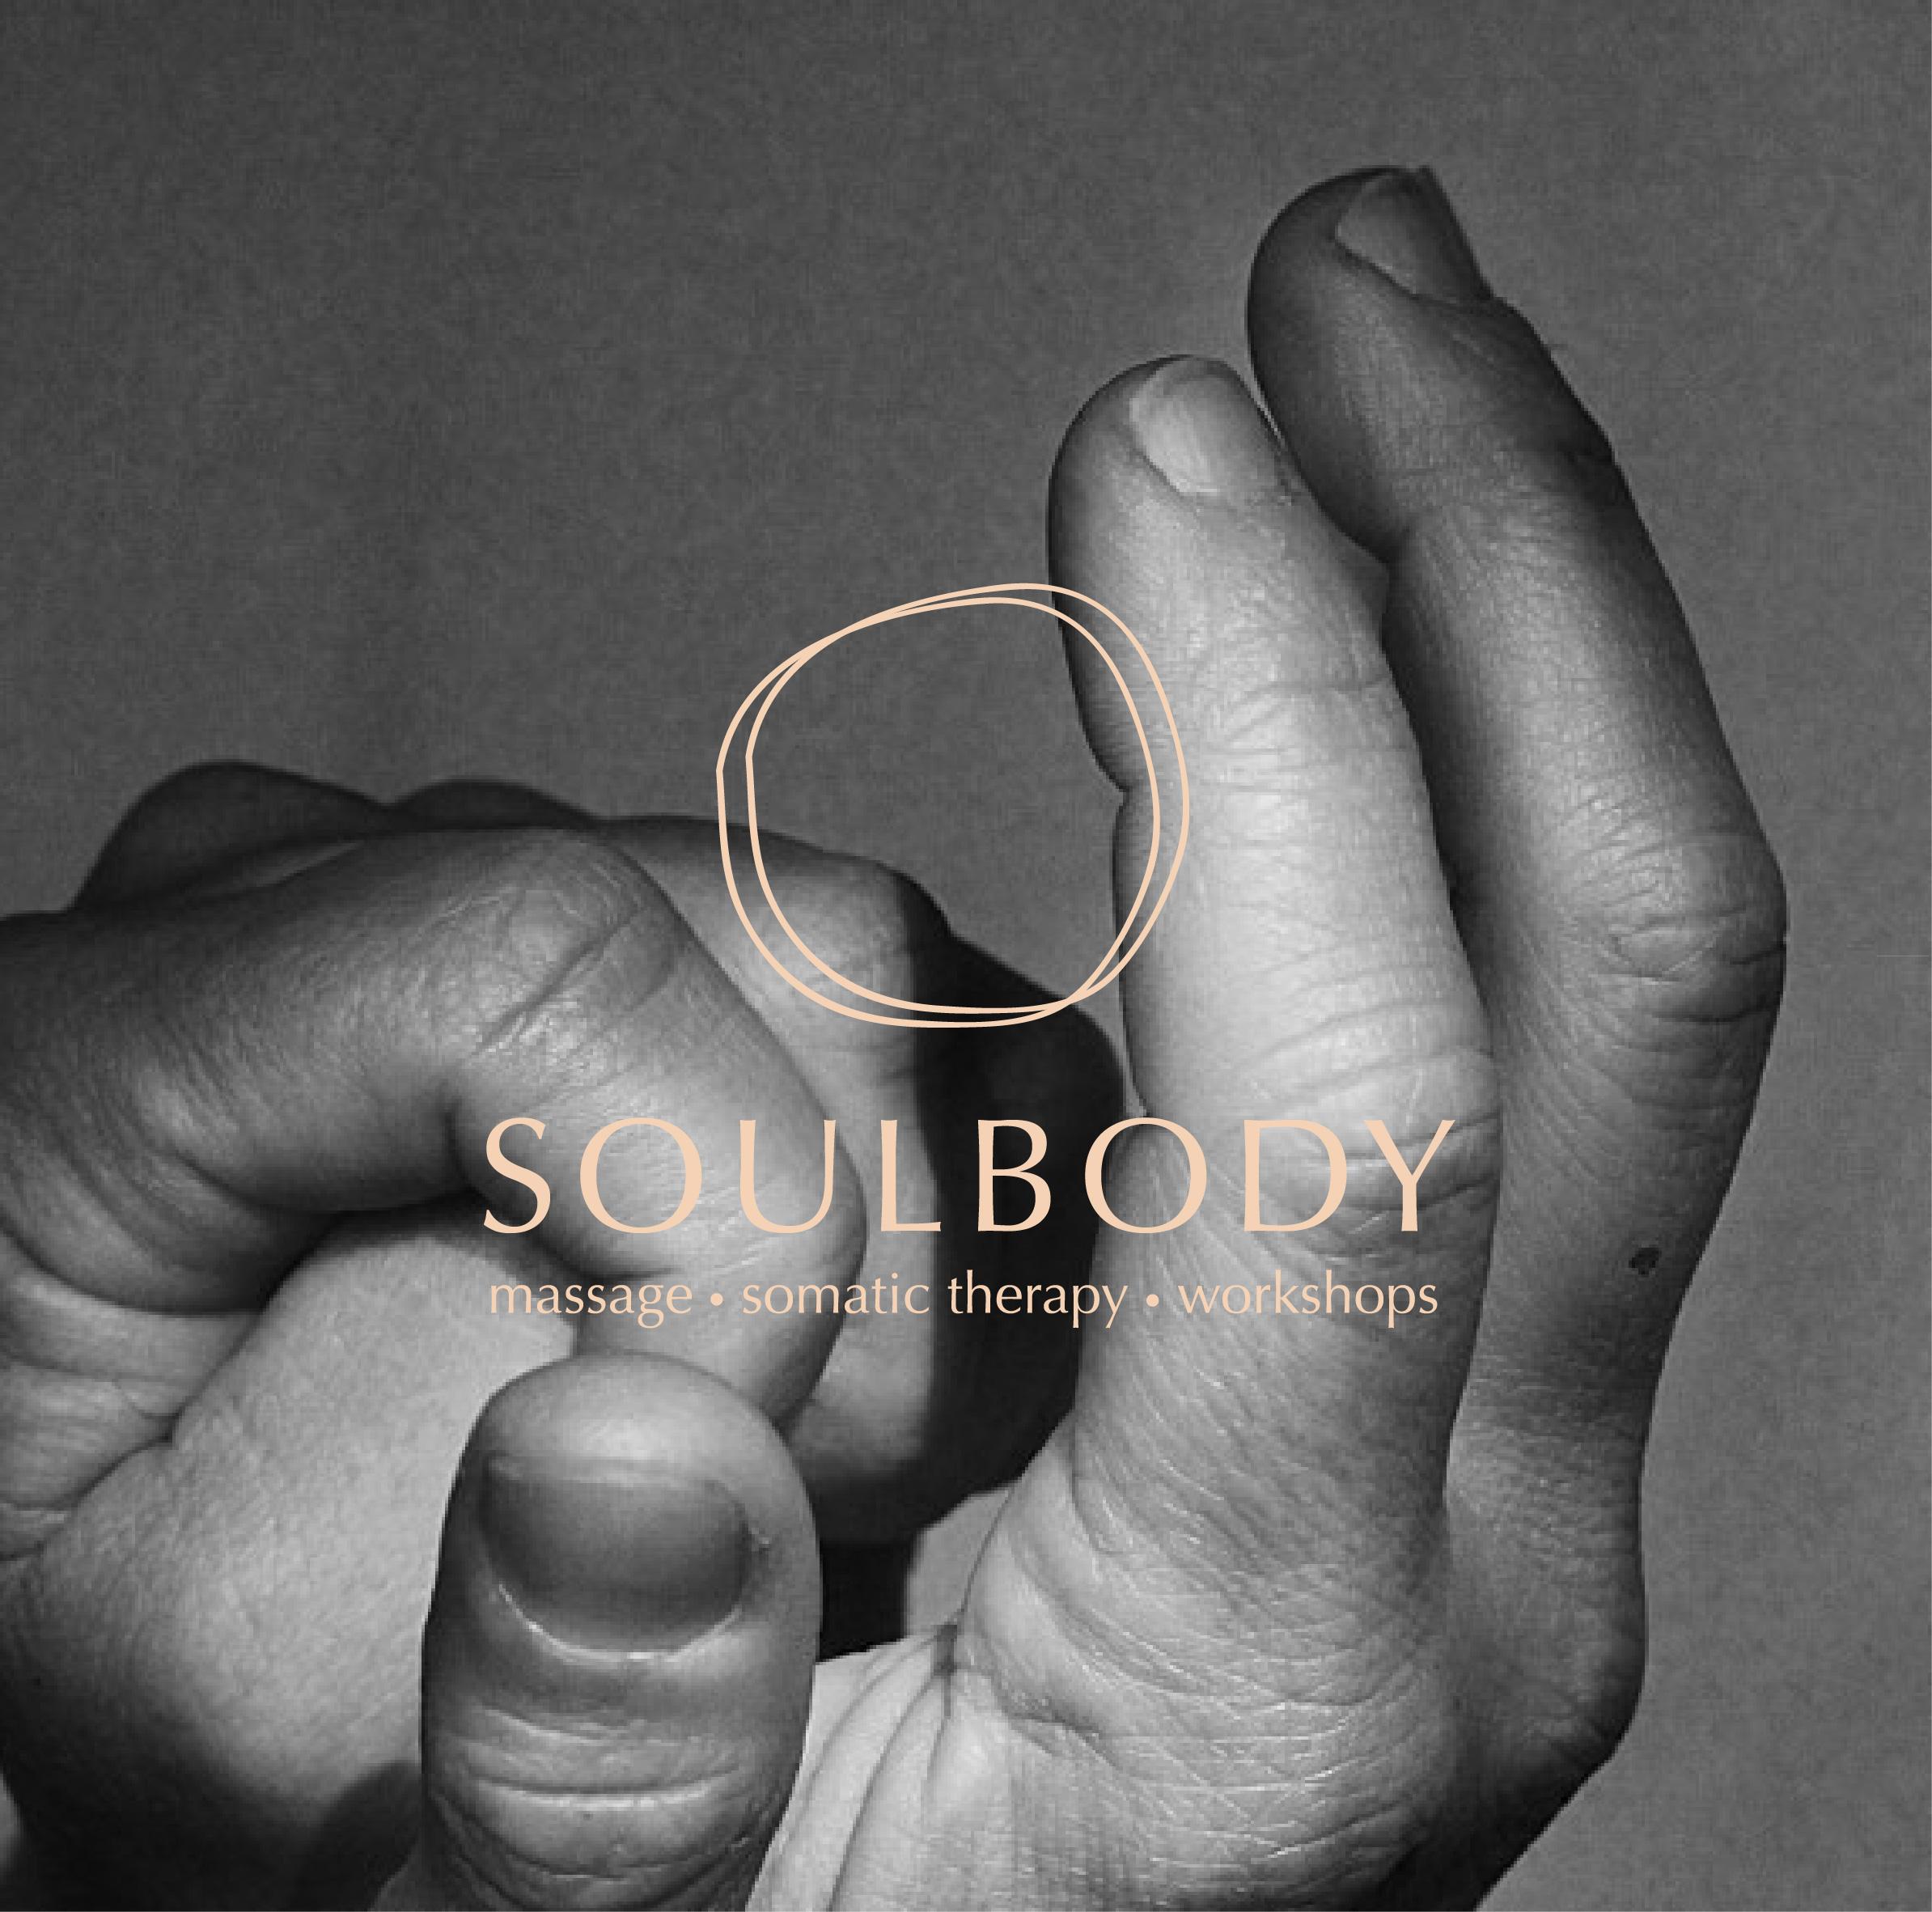 soulbody5.jpg